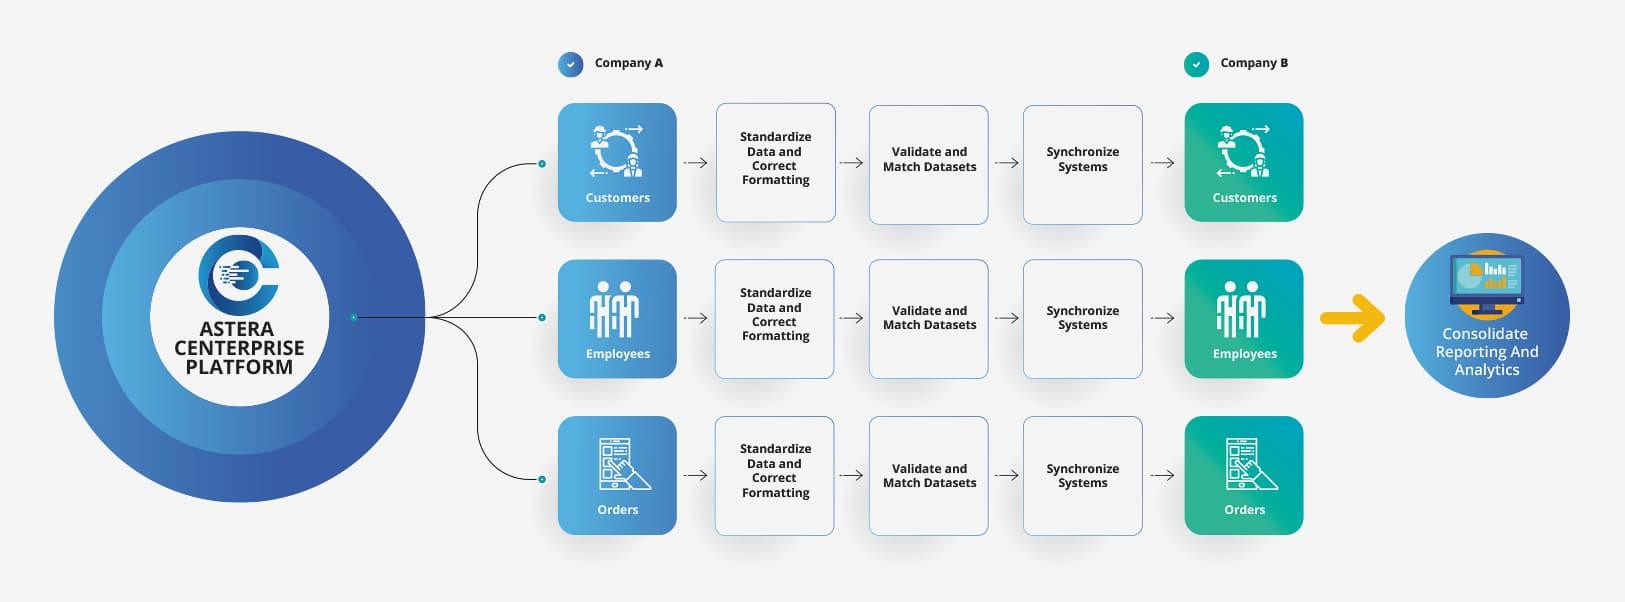 Simplify Post-merger Integration